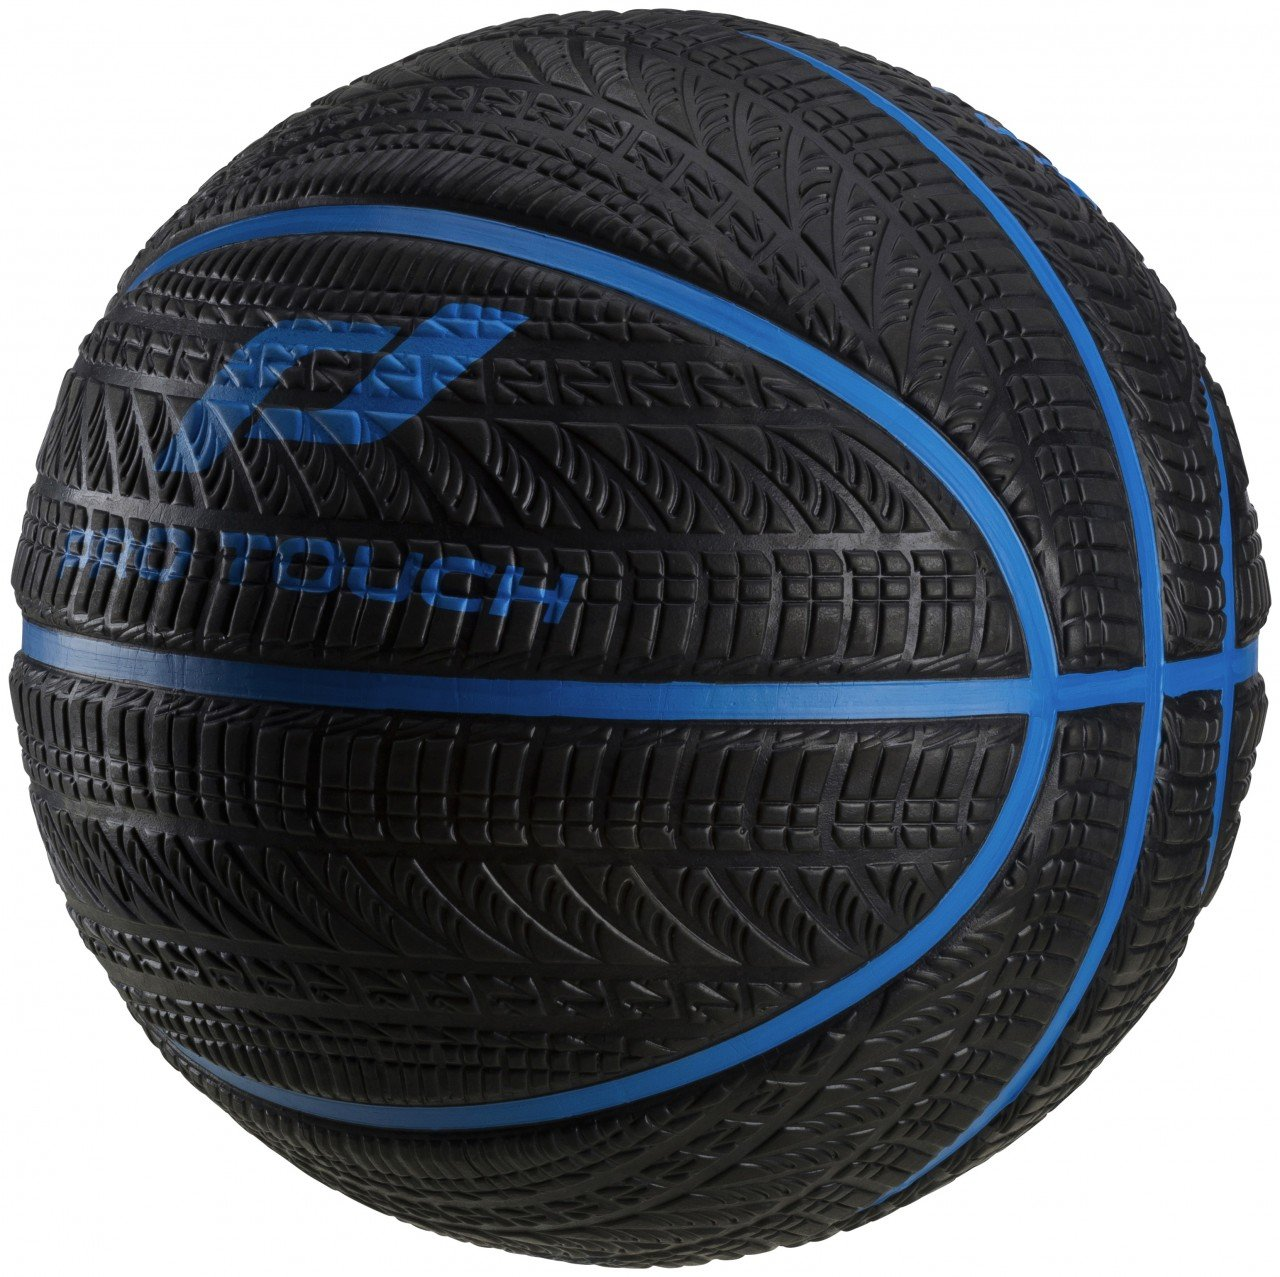 Pro Touch Bask-Ball Asfalt - schwarz/blau Schwarz/Orange 7 PRR8A|#Pro Touch 240334901007